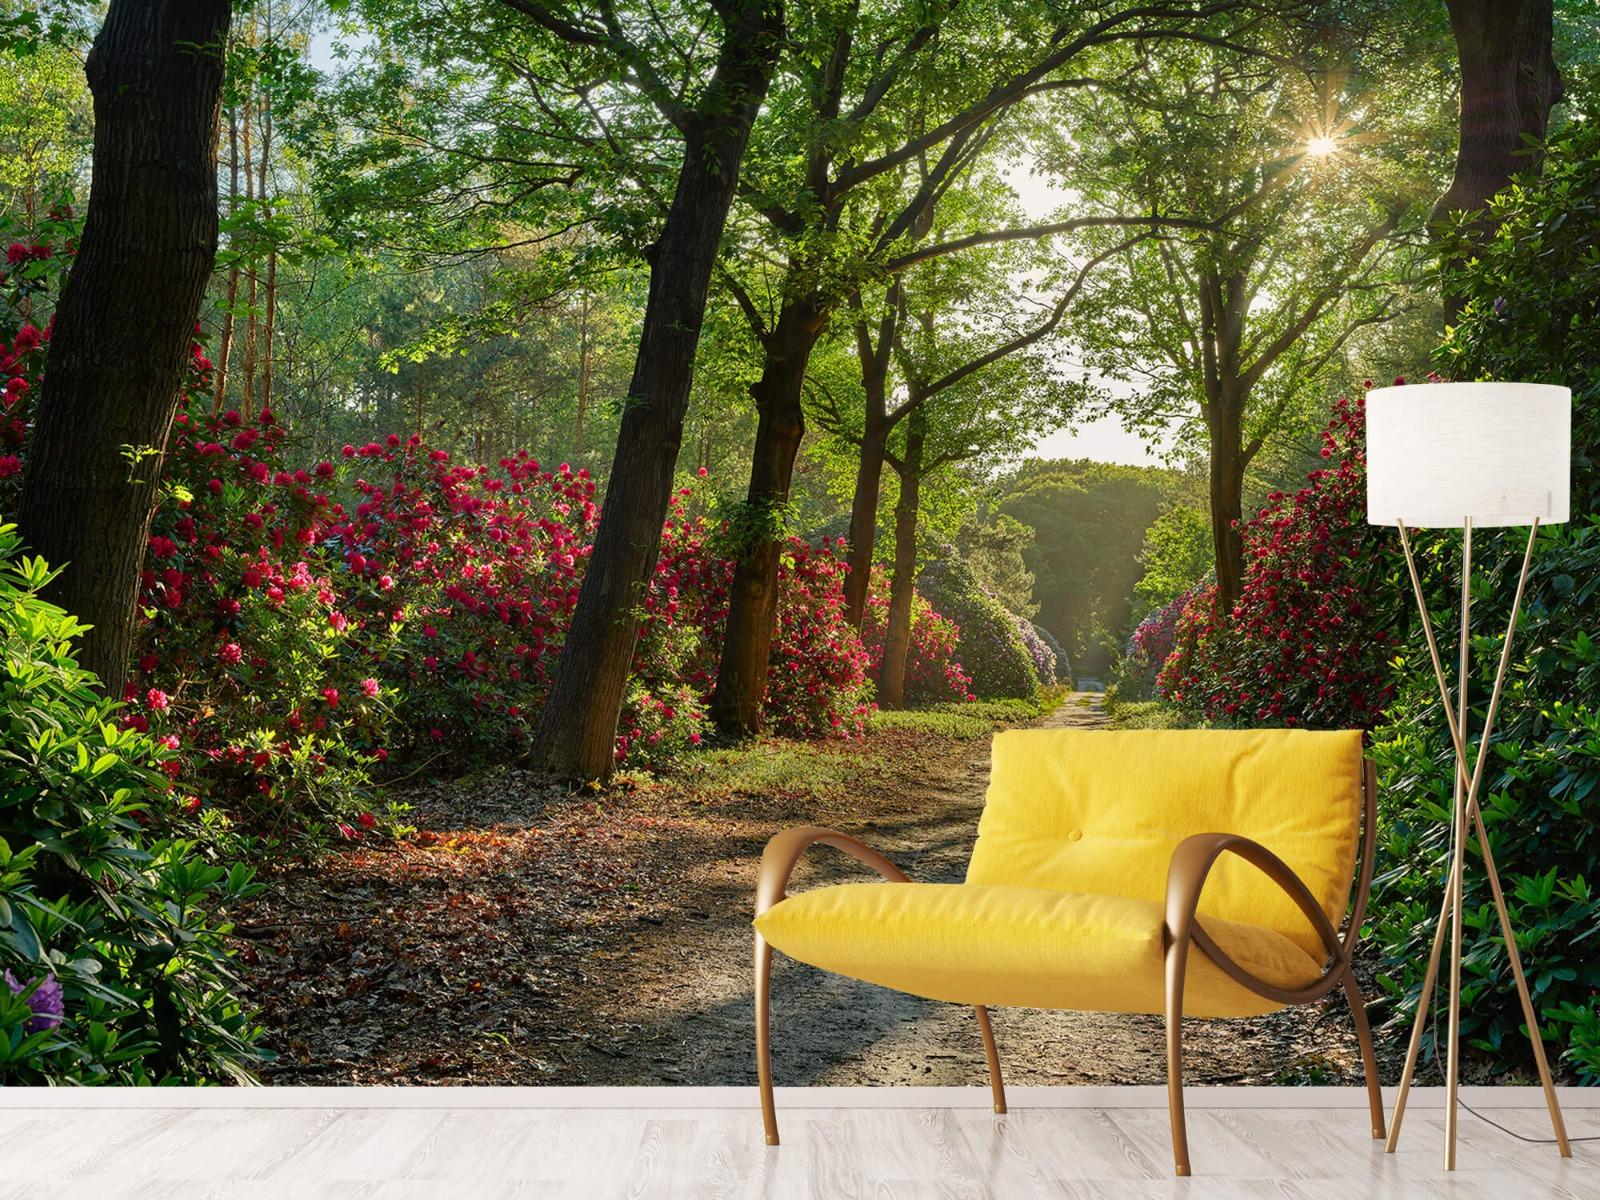 Bos - Zonsopkomst bij pad met rhododendrons 12